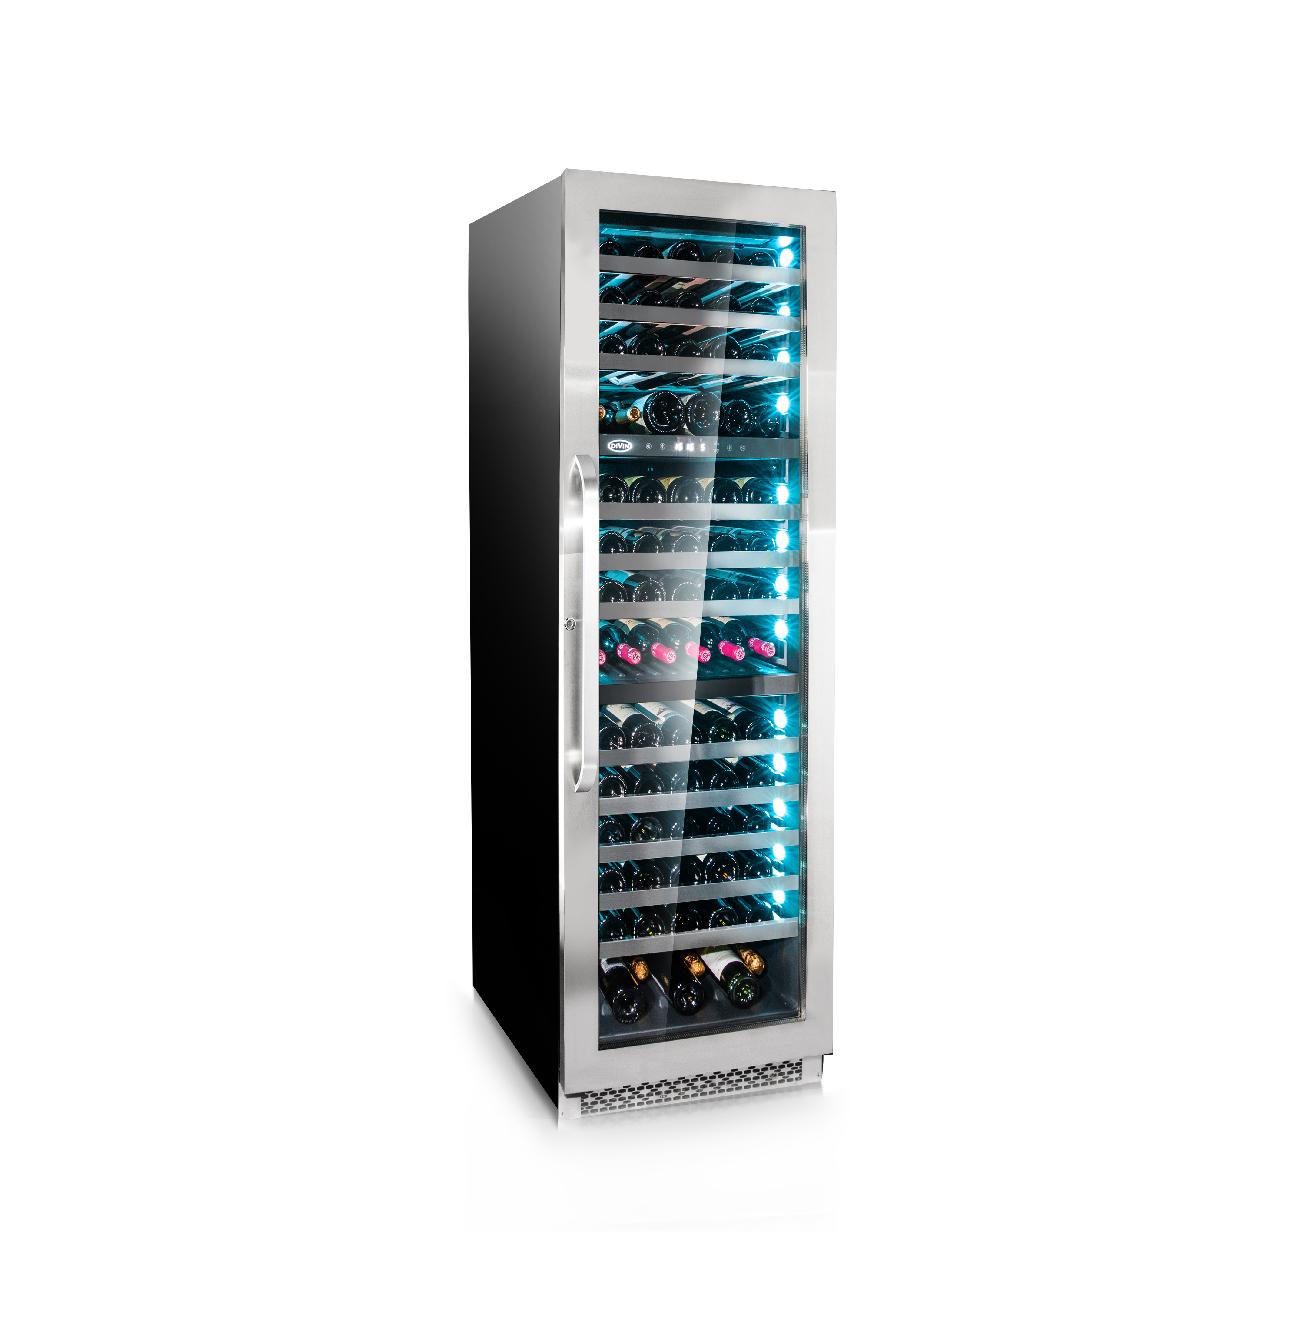 DIVIN-DV 589 TS 三溫葡萄酒櫃  *145瓶 (波爾多標準瓶 750 mL )